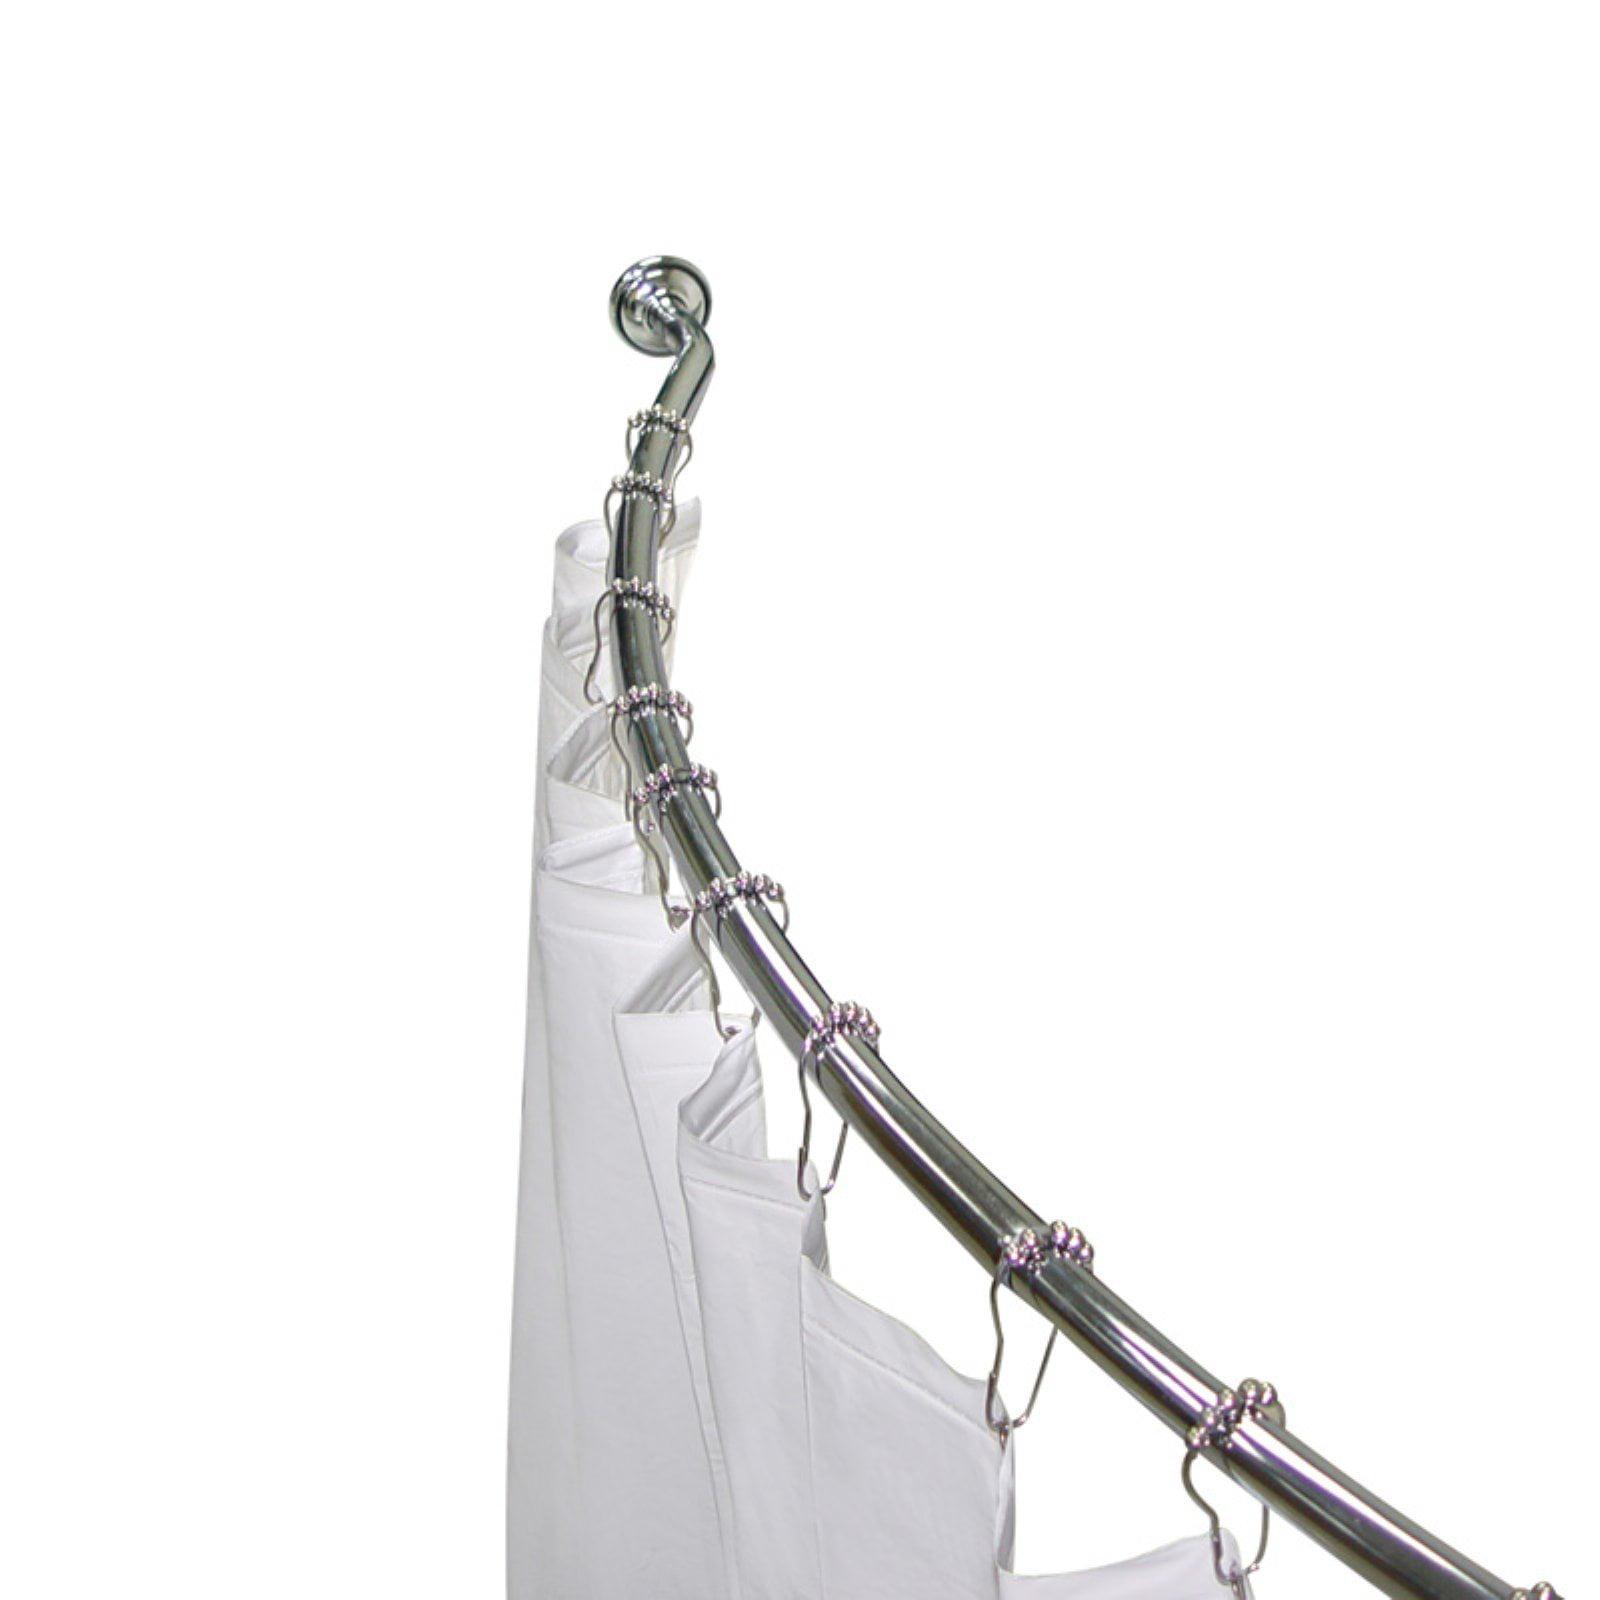 Elegant Home Fashions 3-in-1 Adjustable Curved Shower Rod Value Pack with Shower Hooks